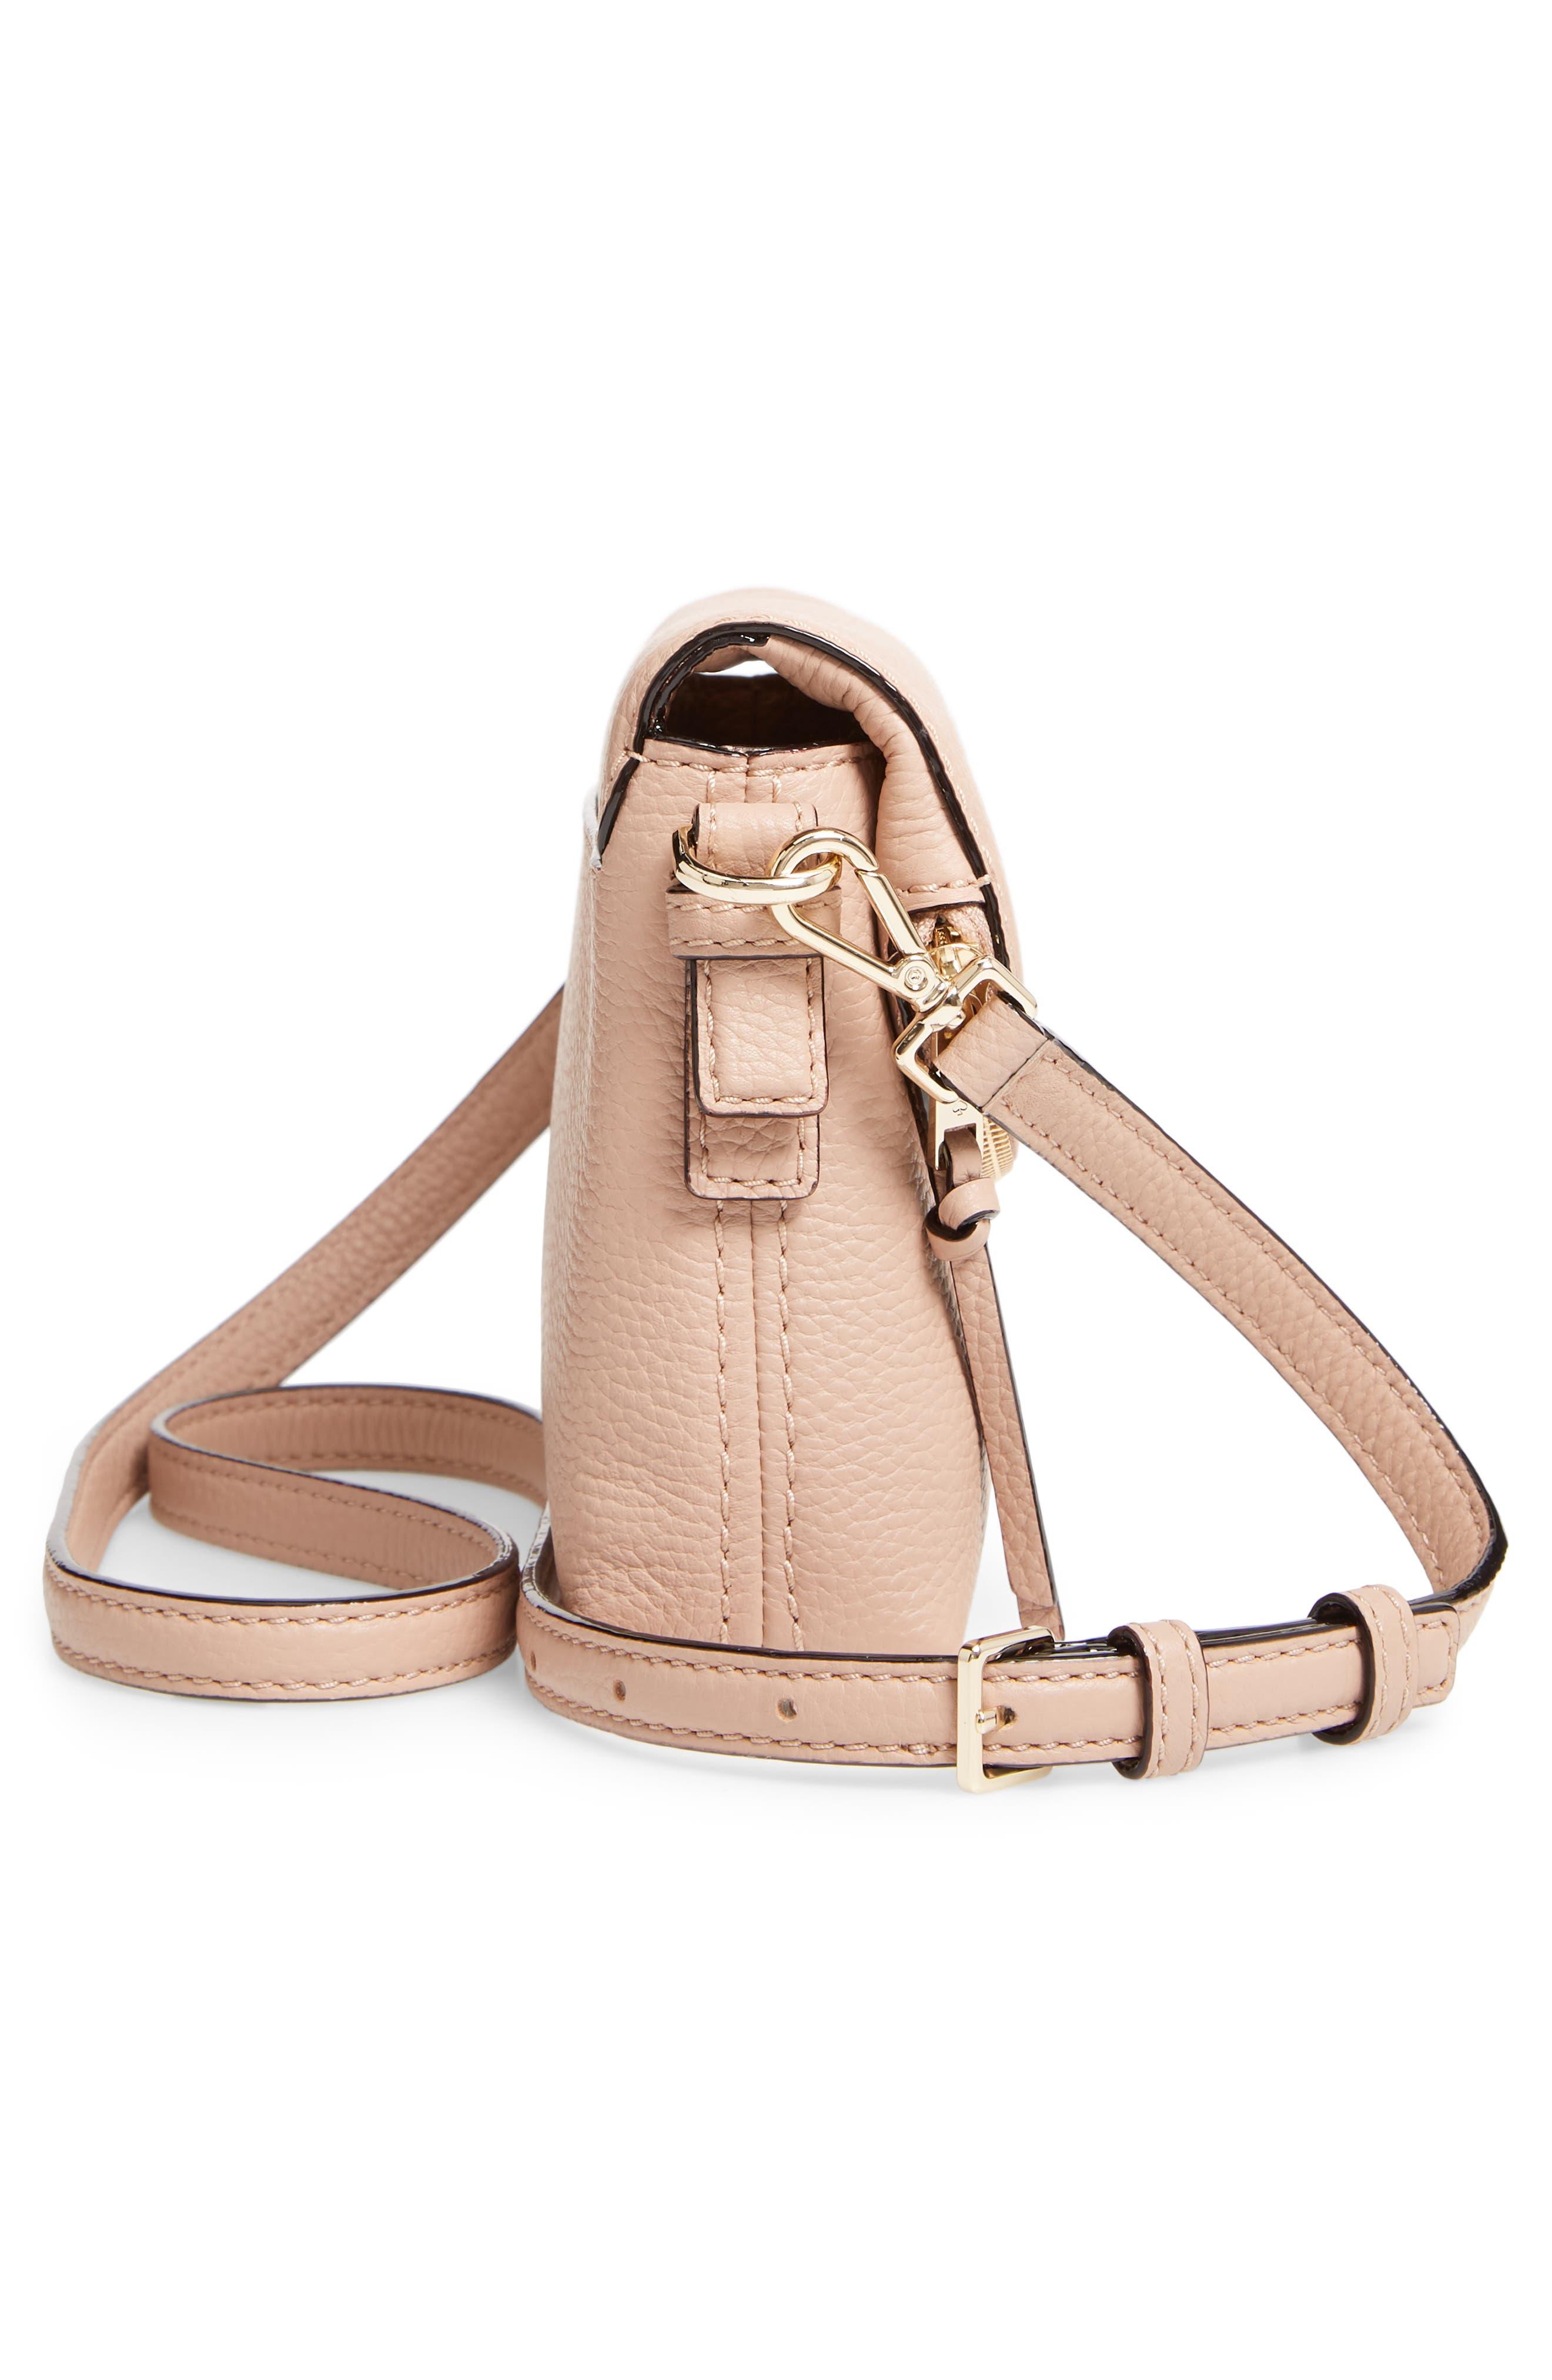 KATE SPADE NEW YORK,                             jackson street small harlyn leather crossbody bag,                             Alternate thumbnail 5, color,                             253